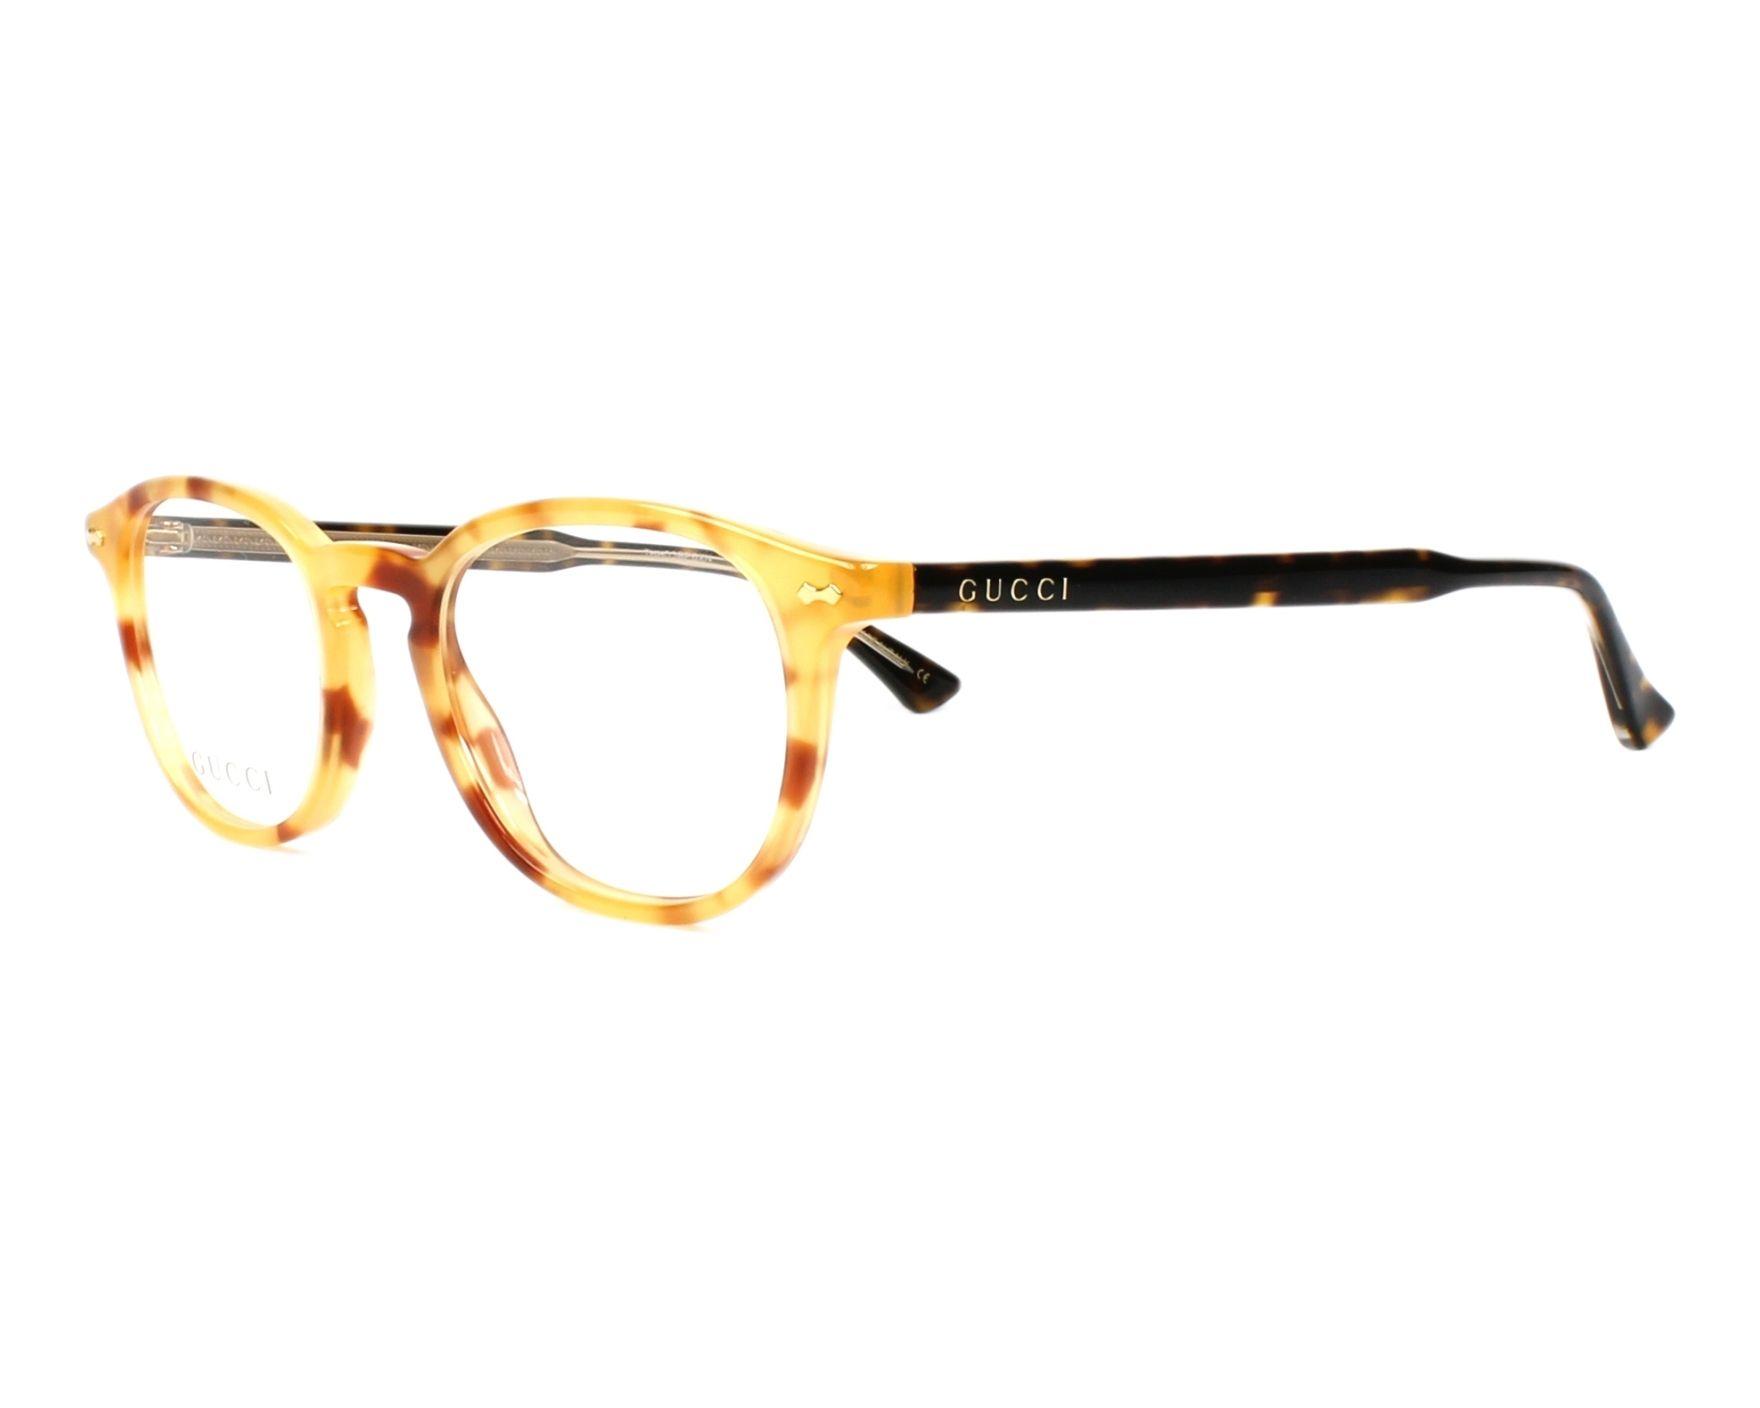 93300ba0352 eyeglasses Gucci GG-0187-O 003 47-20 Brown Havana profile view